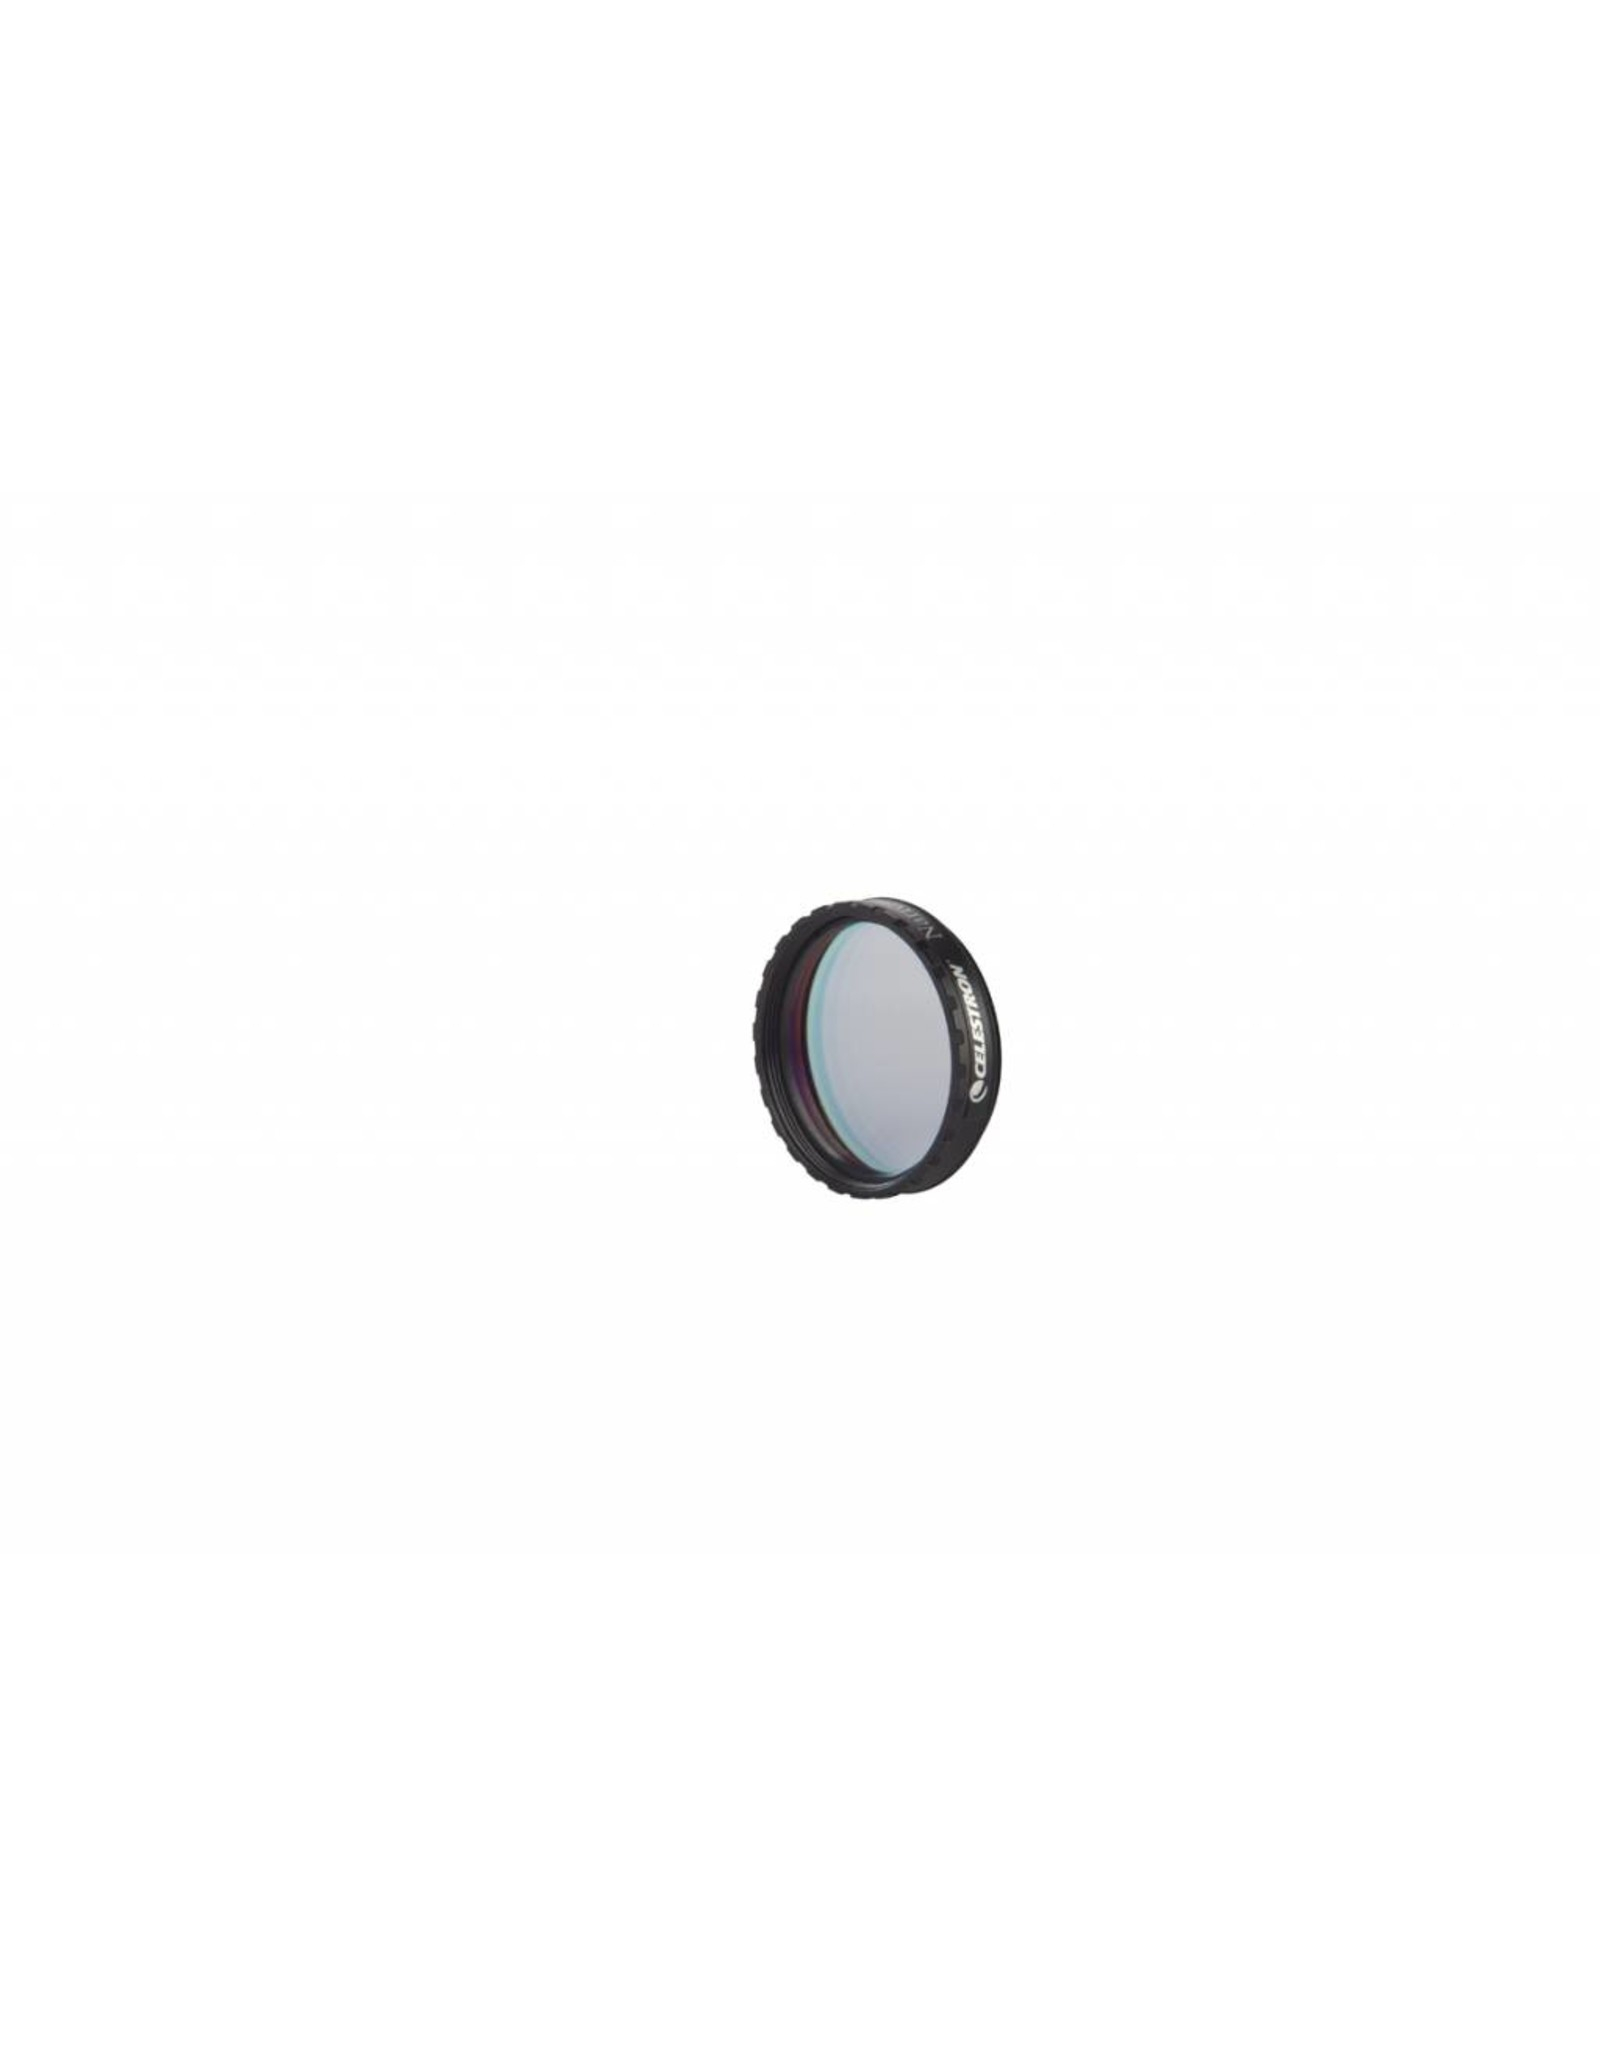 Celestron Celestron Oxygen III Narrowband Filter - 1.25 in